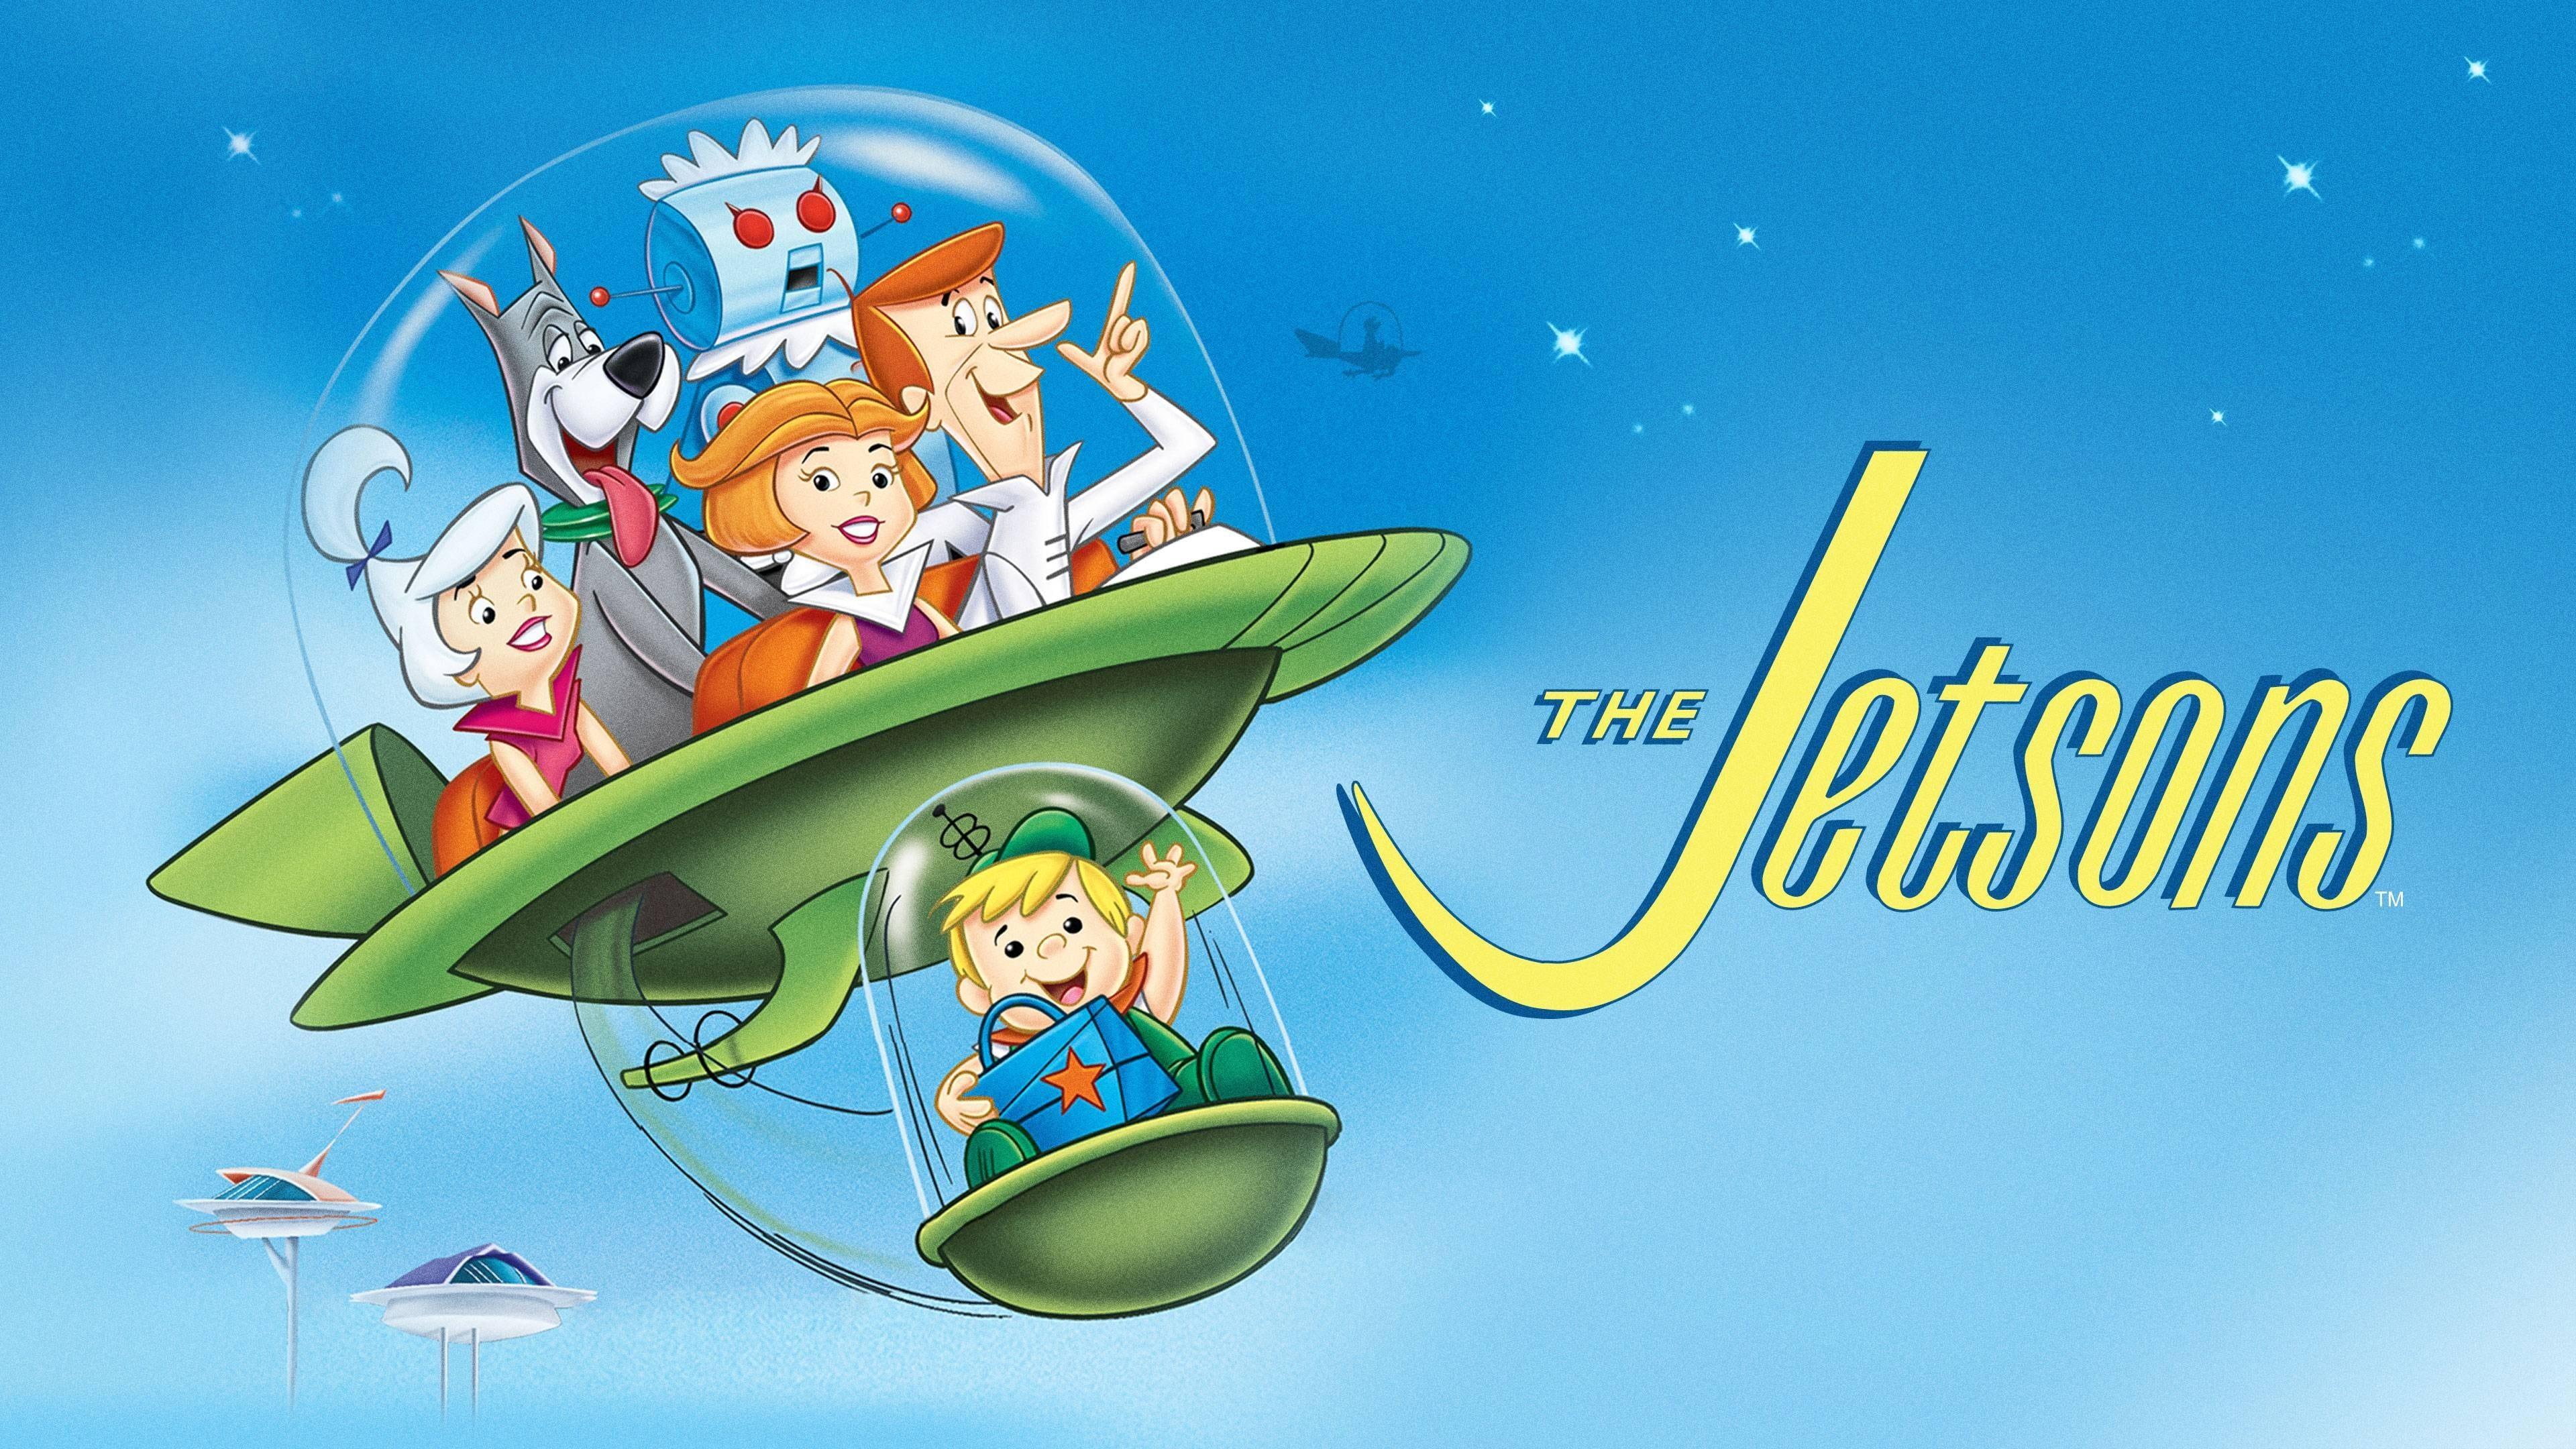 The Jetsons - Season 1